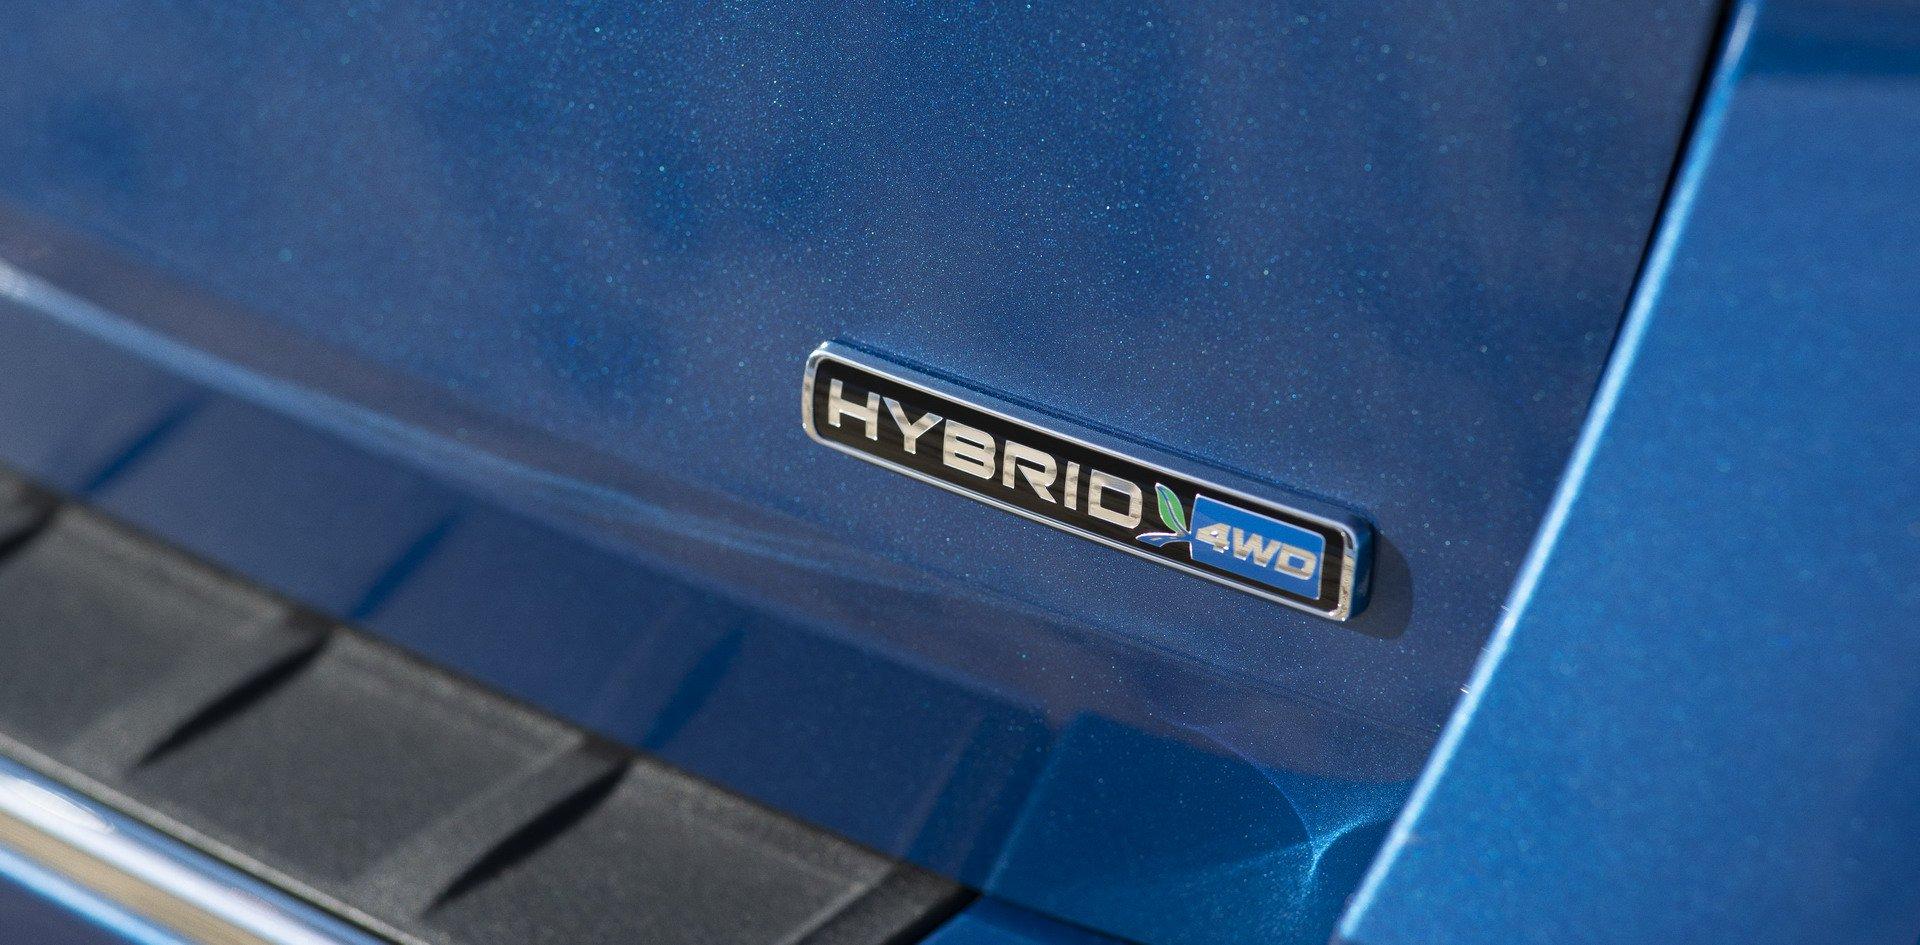 c709eef9-2020-ford-explorer-hybrid-7